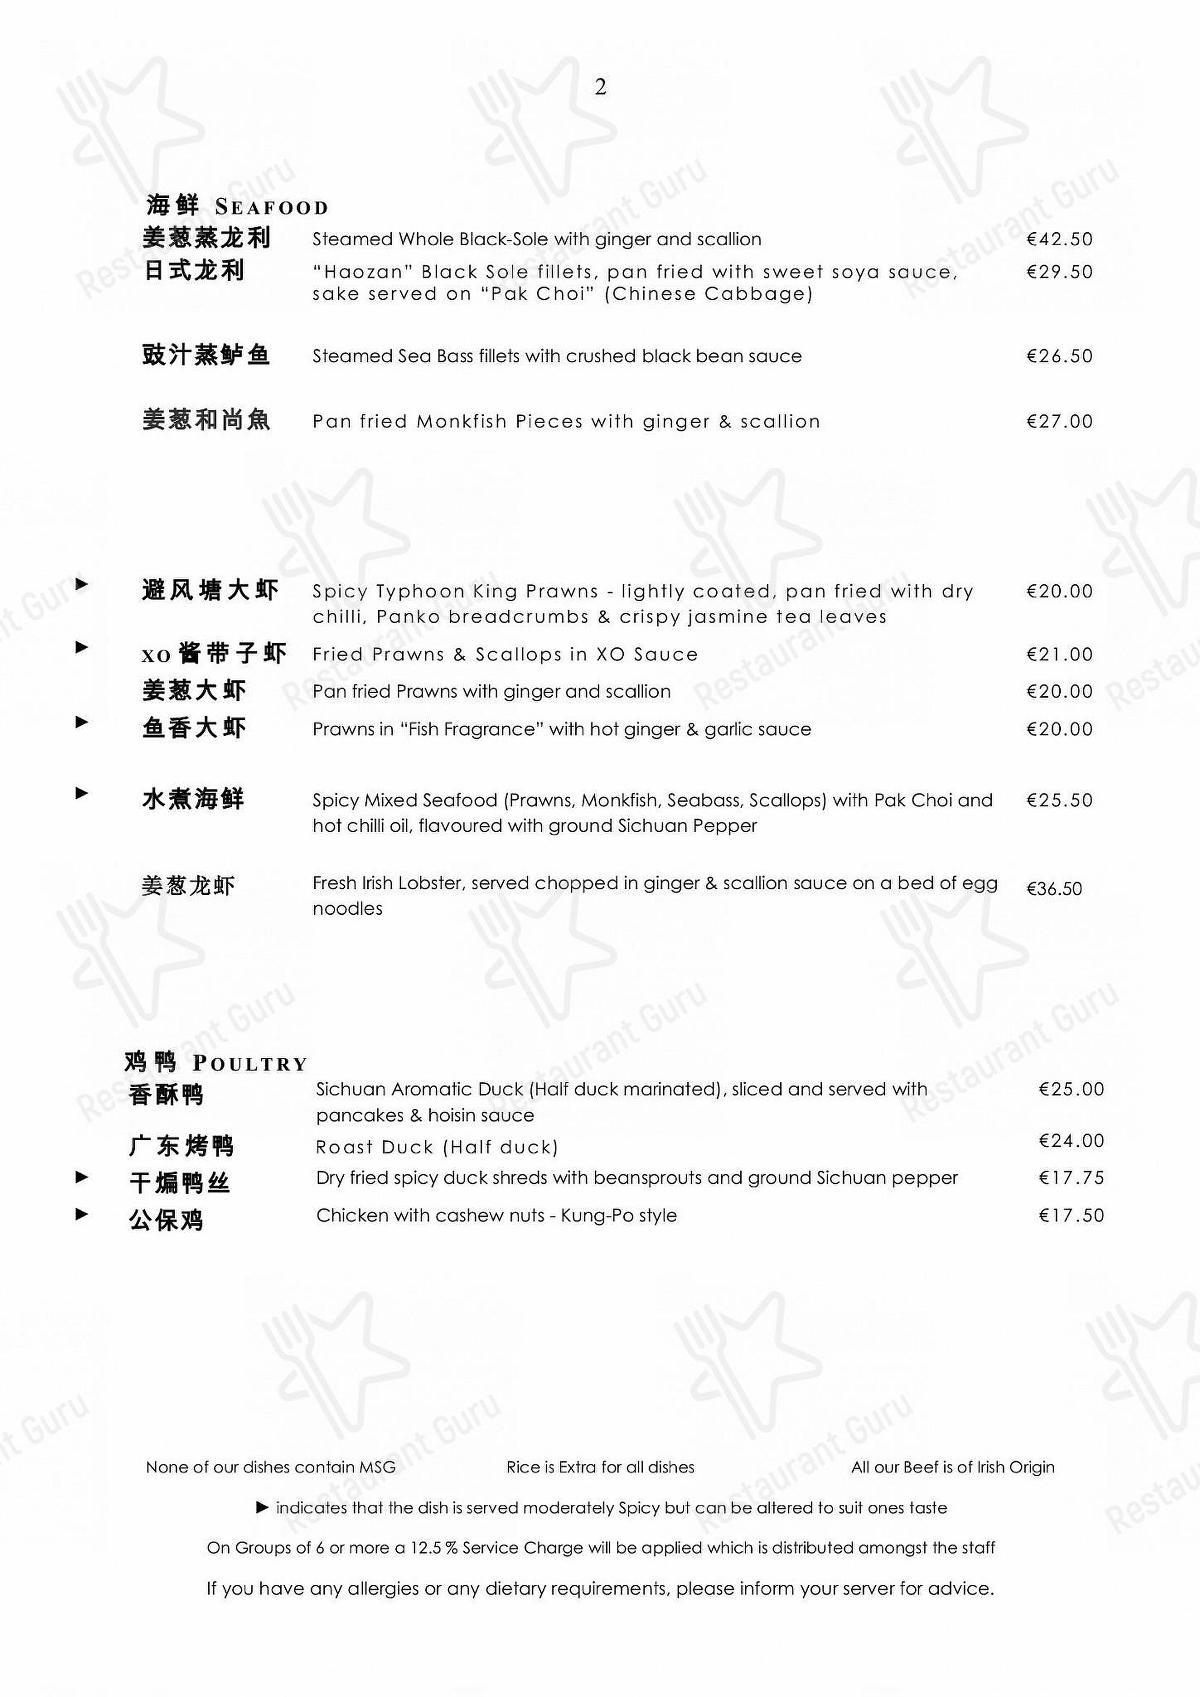 Carta de China Sichuan restaurante